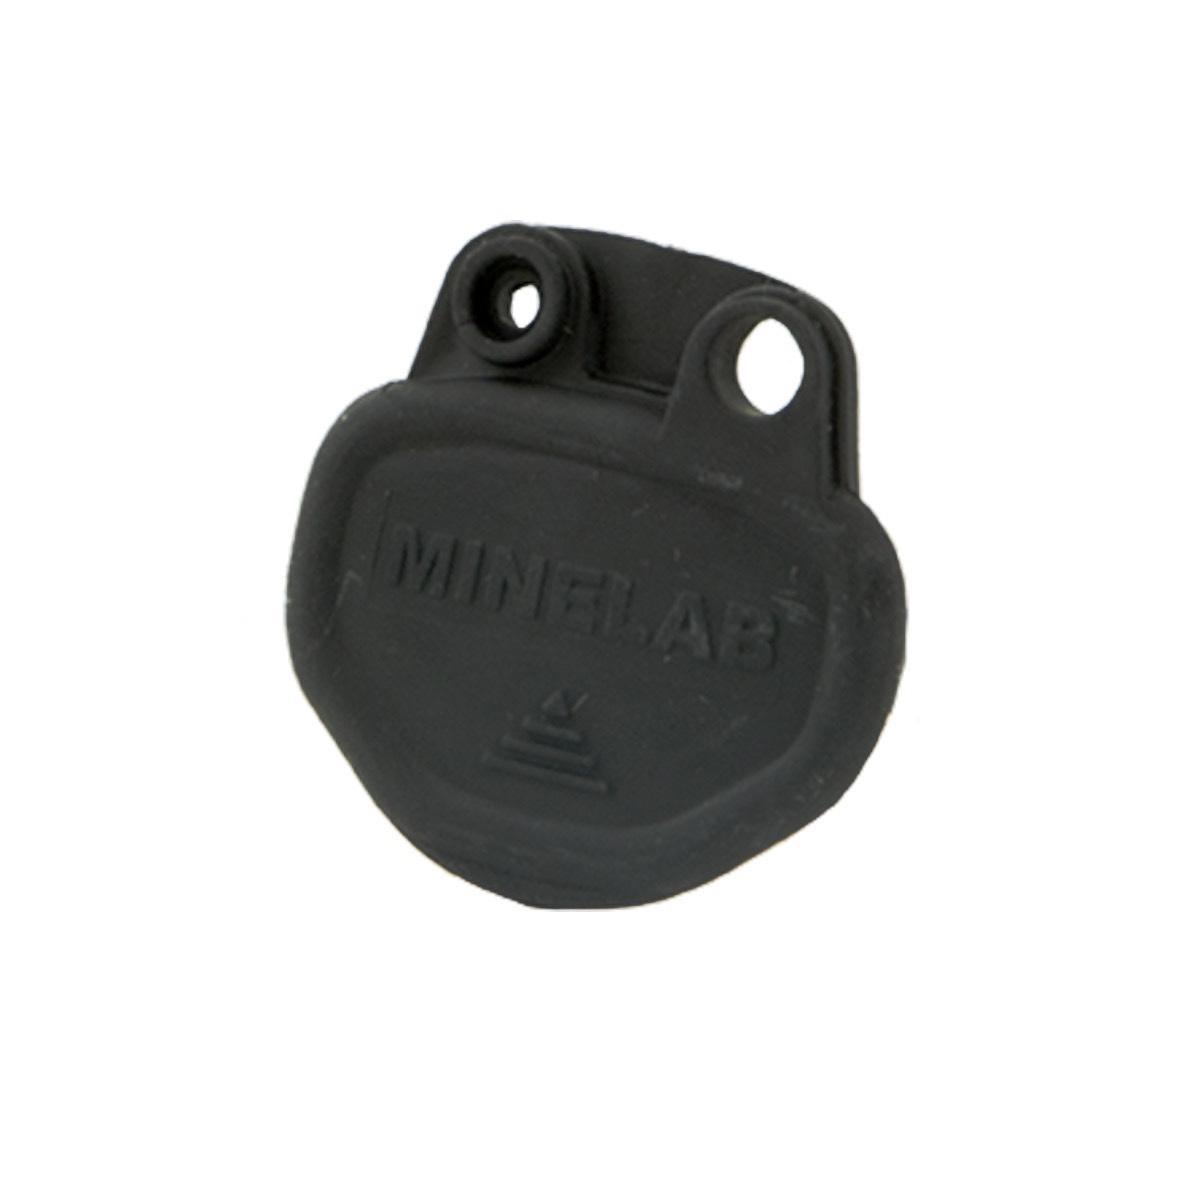 4309-0049, Handle Seal for E-TRAC